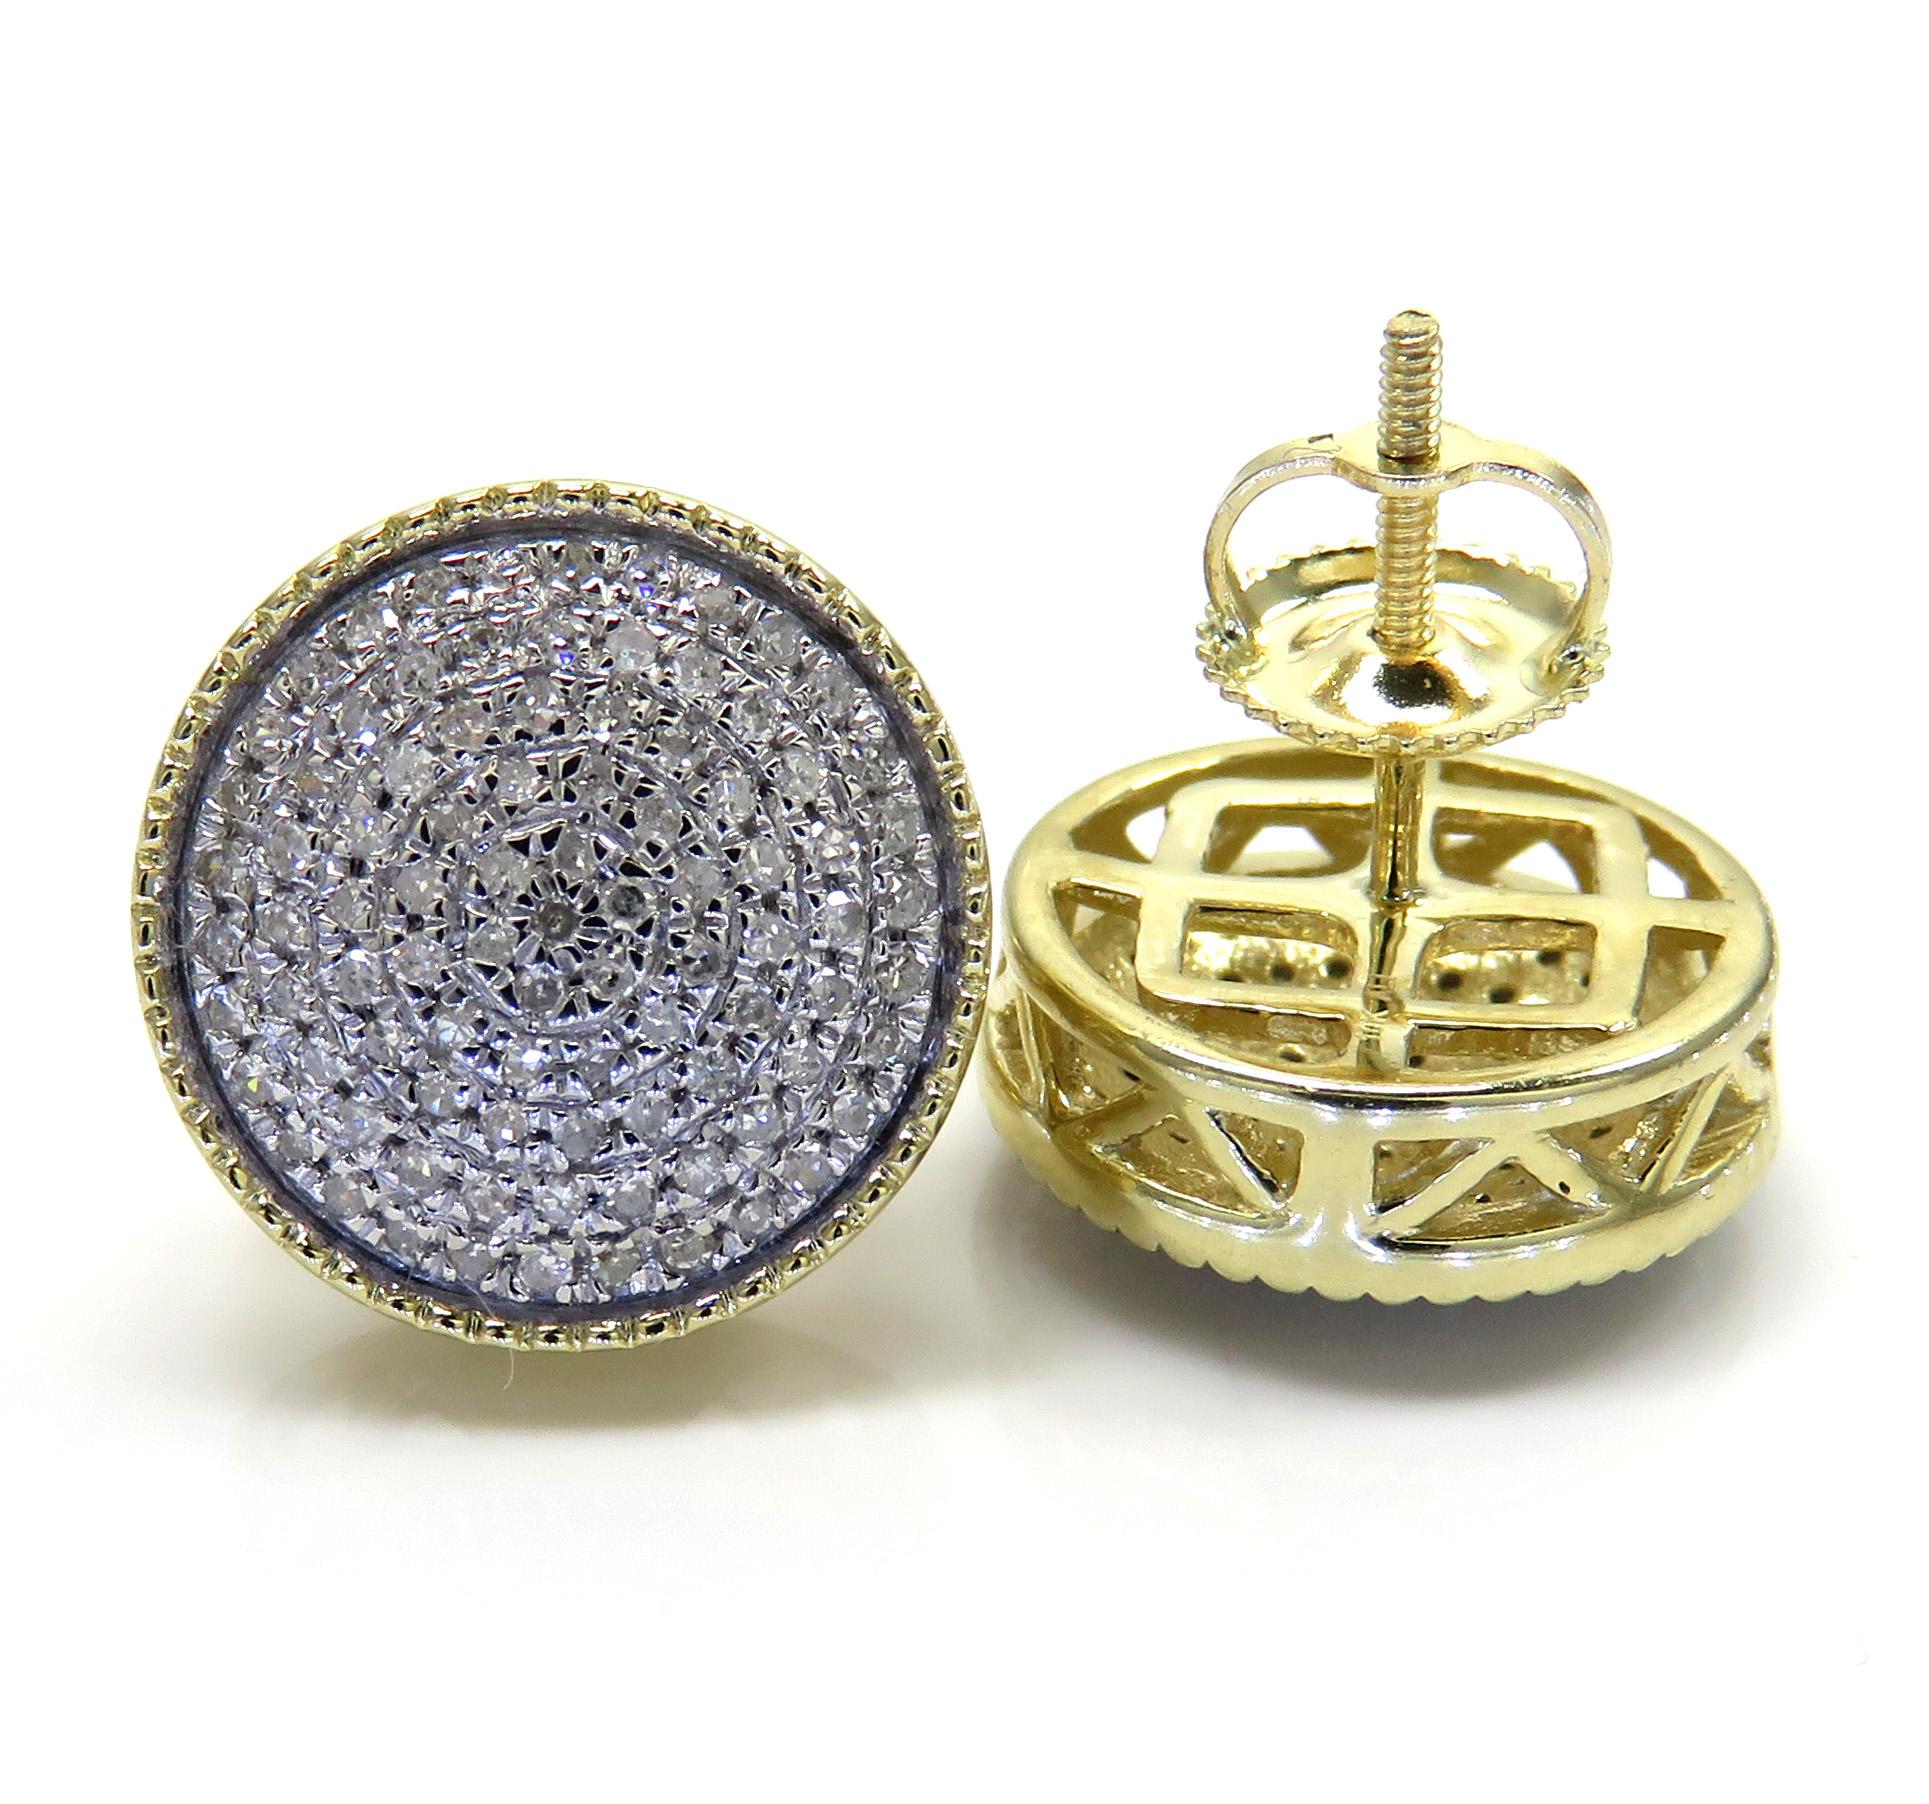 10k yellow gold xl diamond snow cap earrings 0.48ct